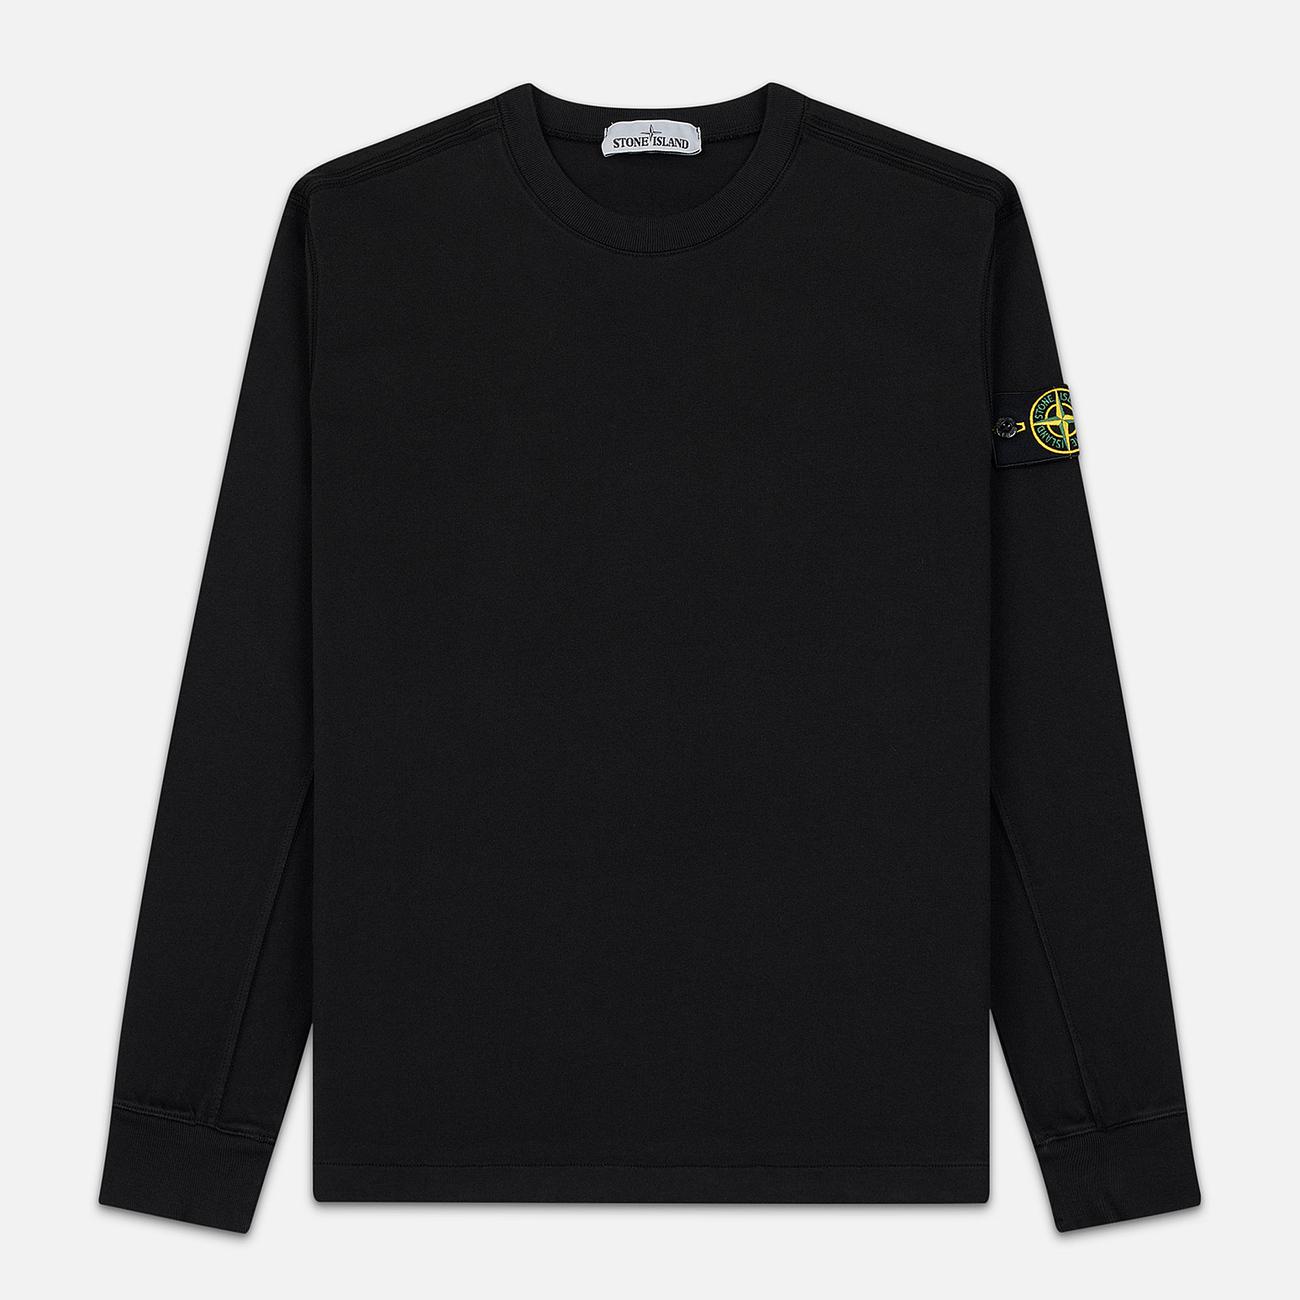 Мужская толстовка Stone Island Crew Neck Heavy Cotton Garment Dyed Black